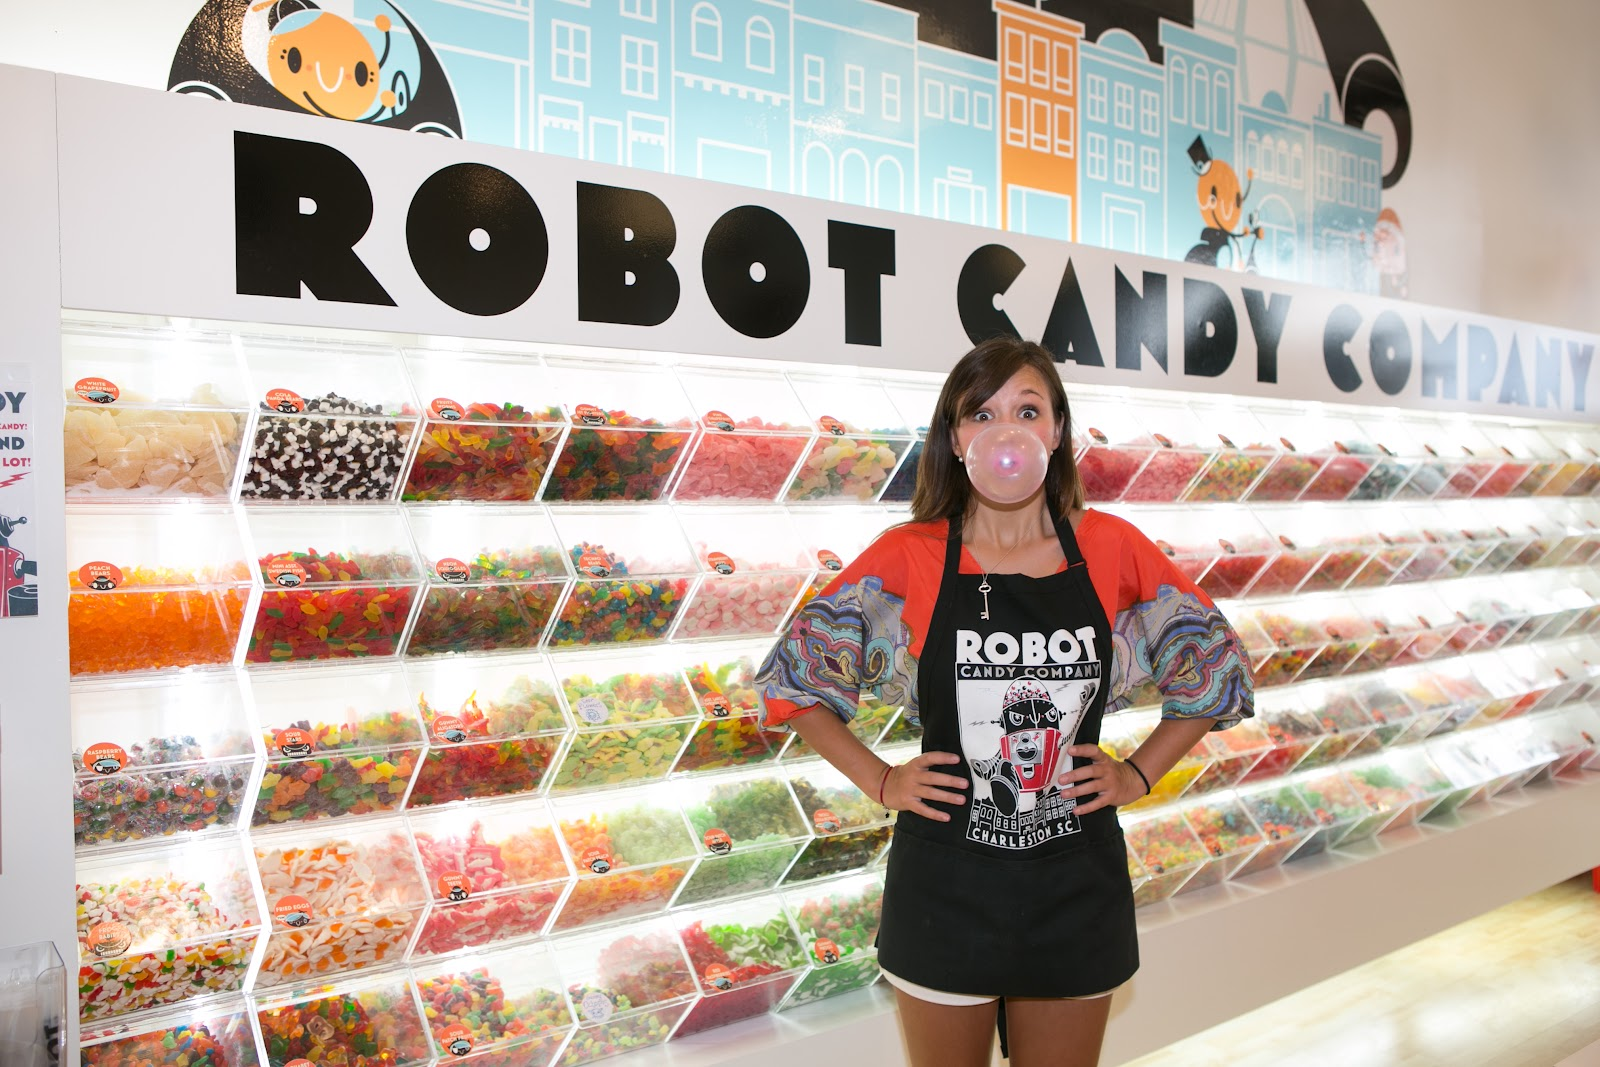 RobotCandyCo-5.jpg